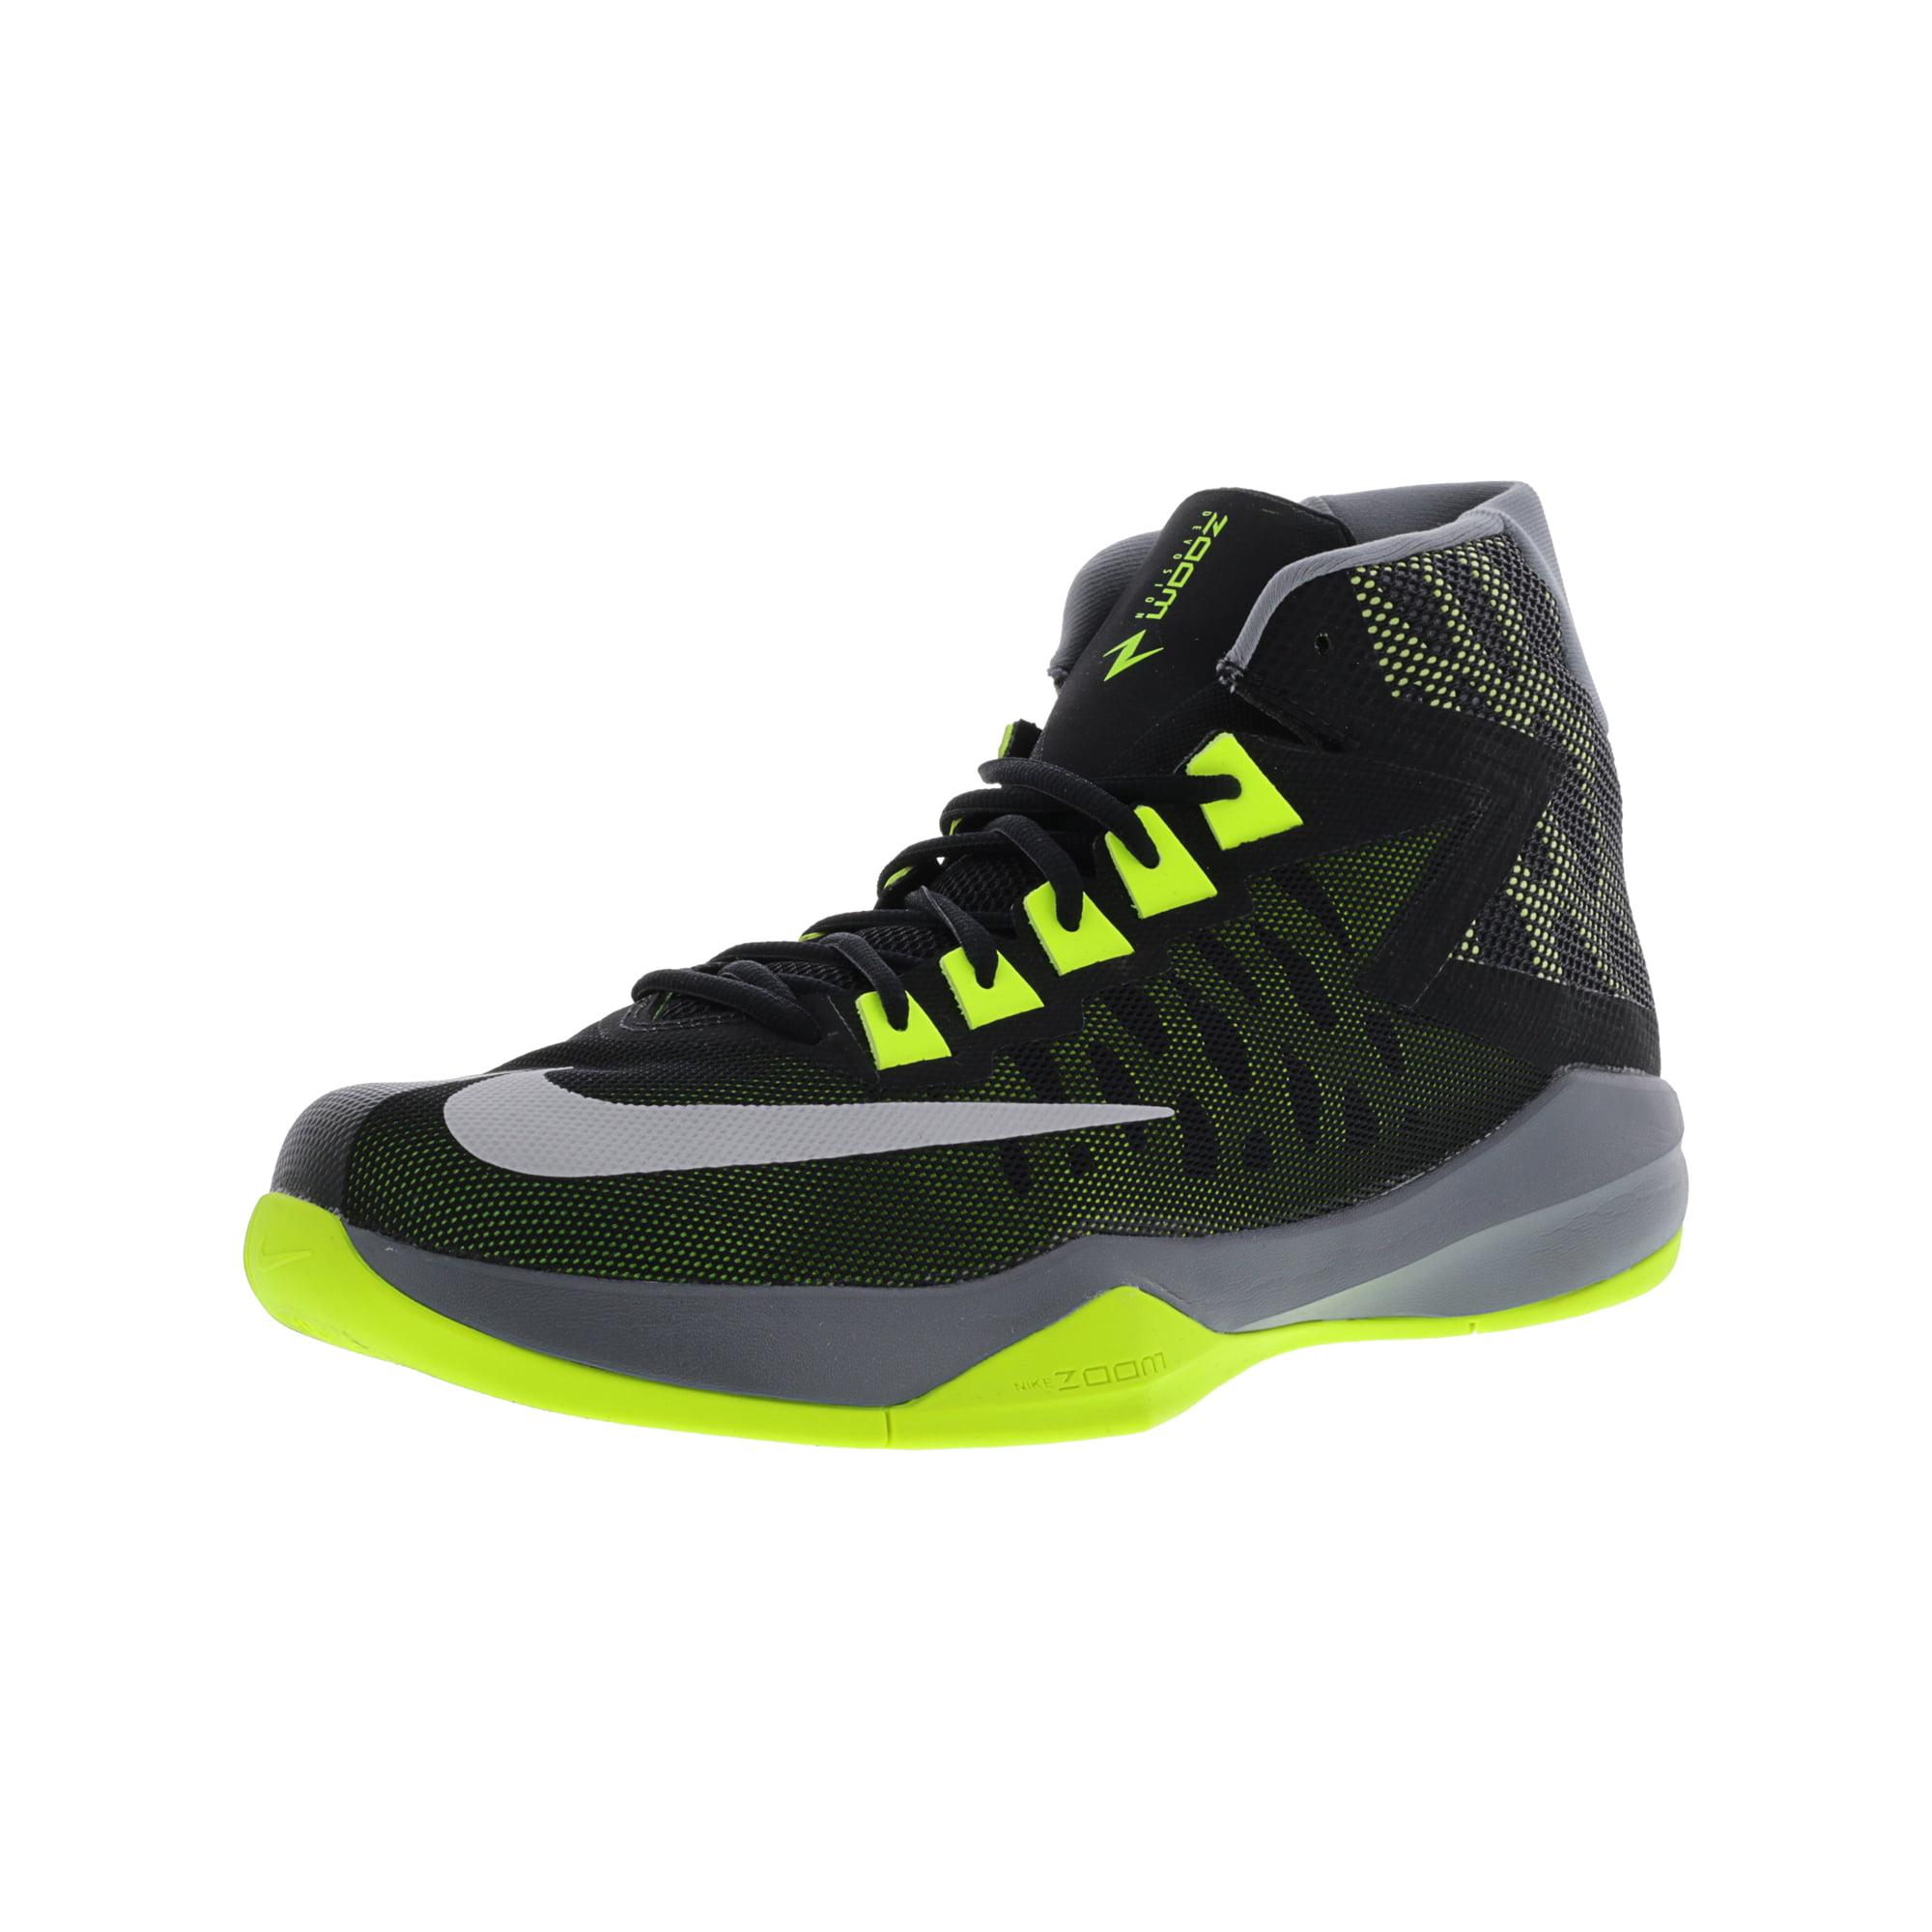 29bd9663ef67 Nike Men s Zoom Devosion Black   Reflect Silver - Cool Grey High-Top  Basketball Shoe 10.5M